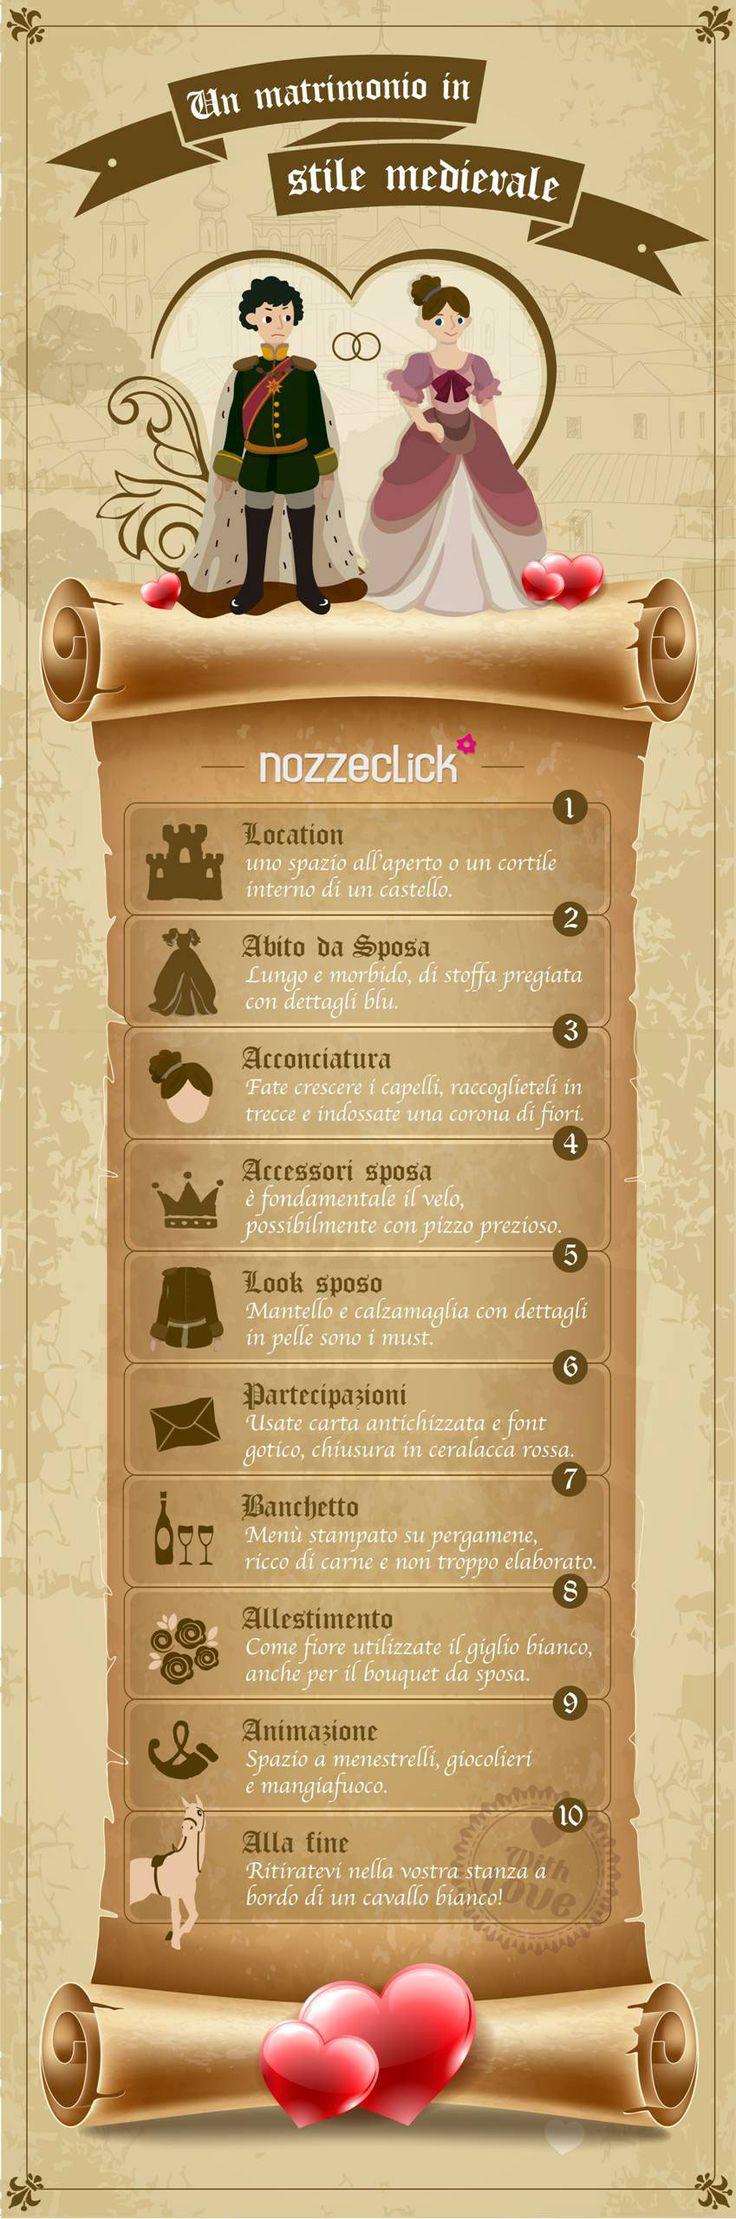 Decalogo del #matrimonio in stile medievale! #matrimoniocreativo #matrimoniomedievale #matrimonioatema #medioevo